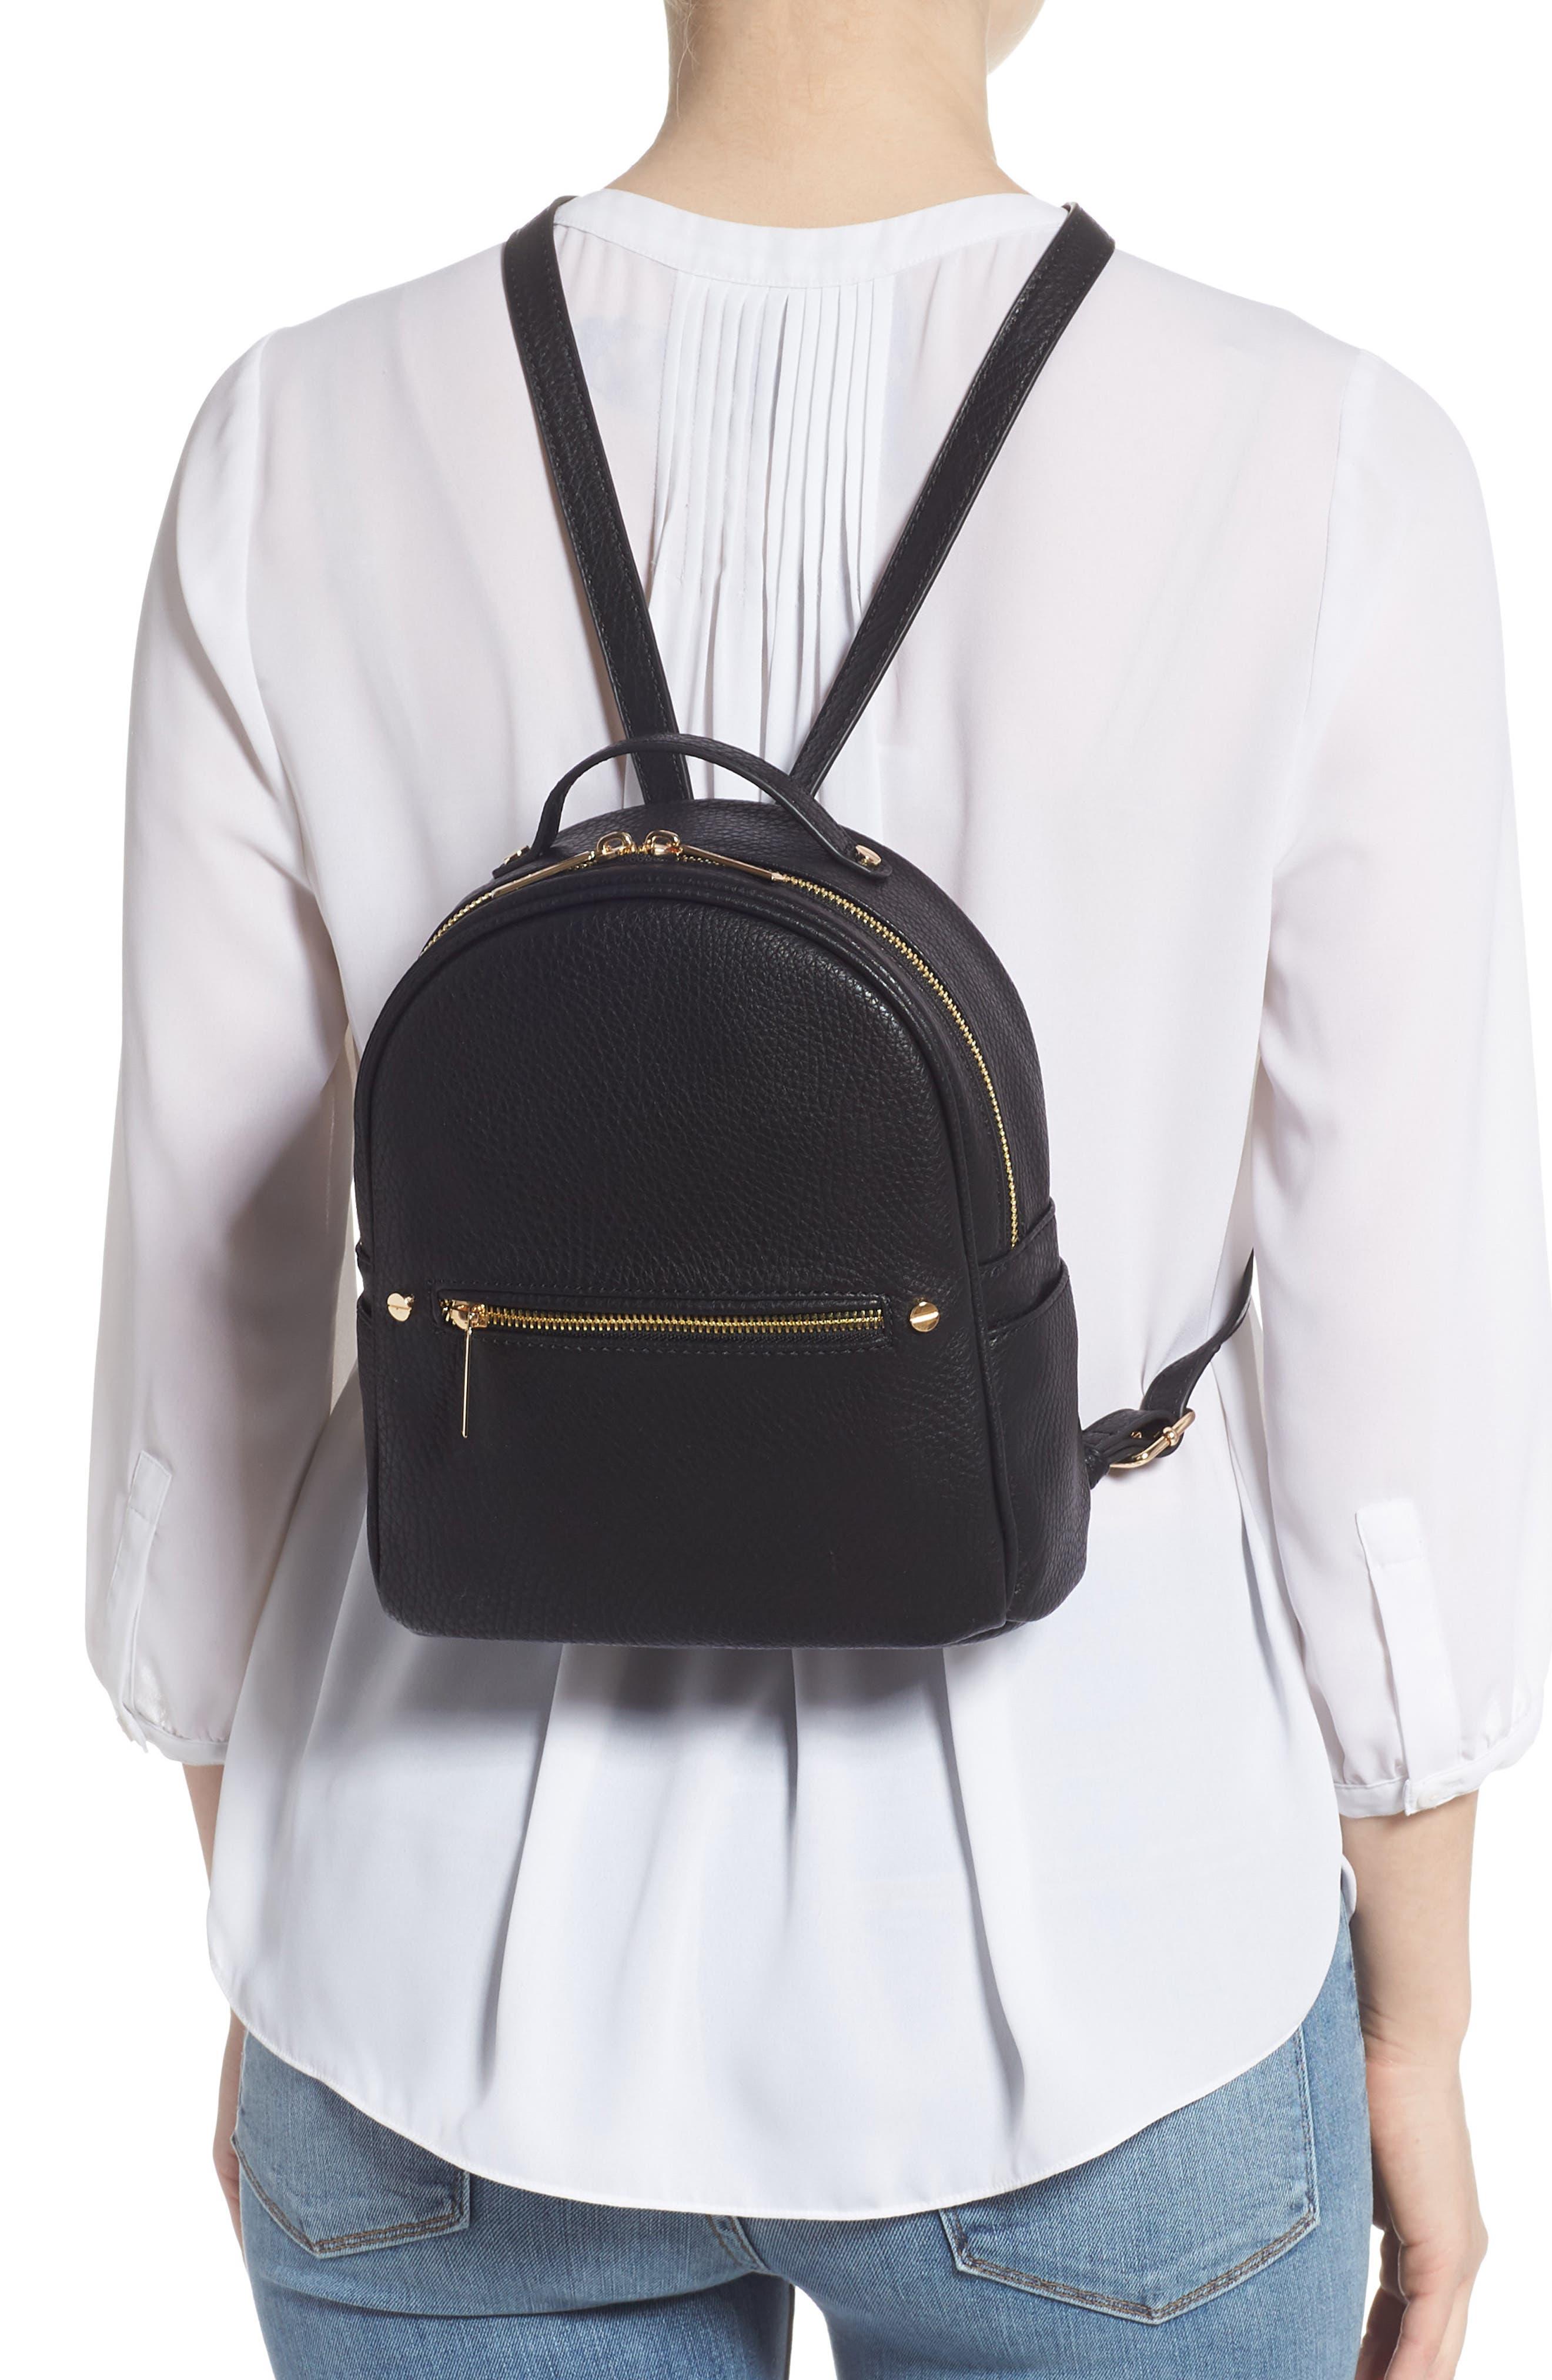 MALI + LILI,                             Hanny Vegan Leather Backpack,                             Alternate thumbnail 2, color,                             BLACK